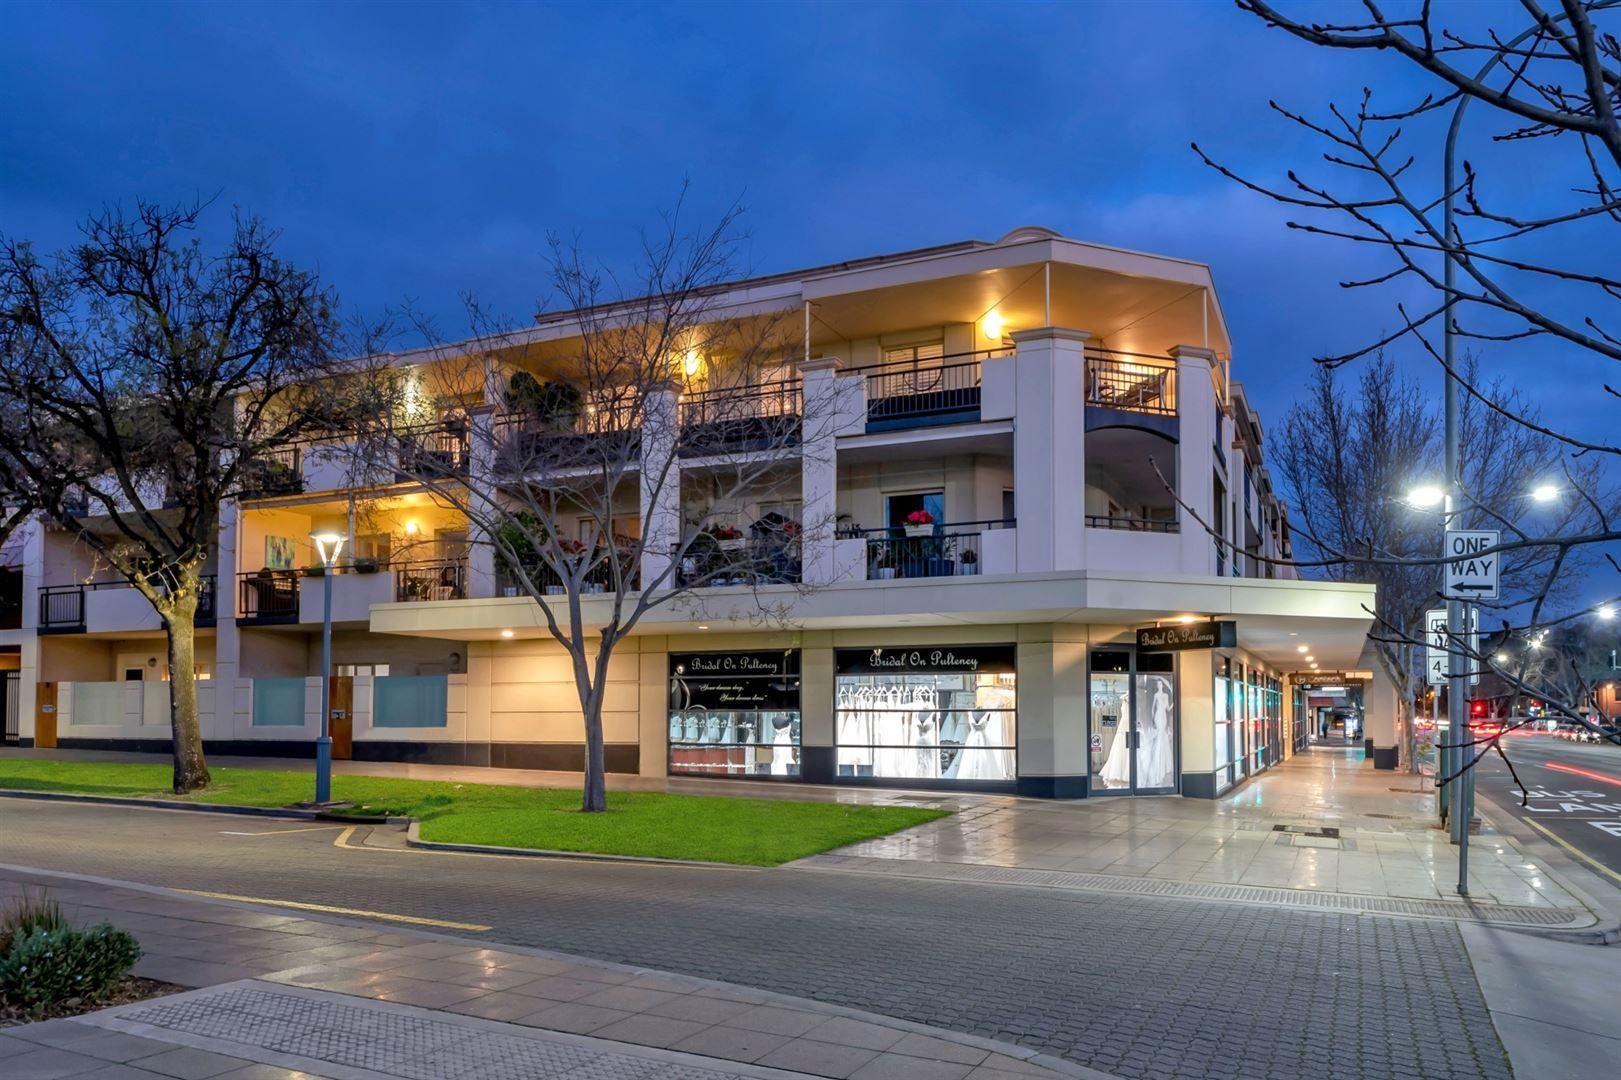 19/422 Pulteney Street, Adelaide SA 5000, Image 0